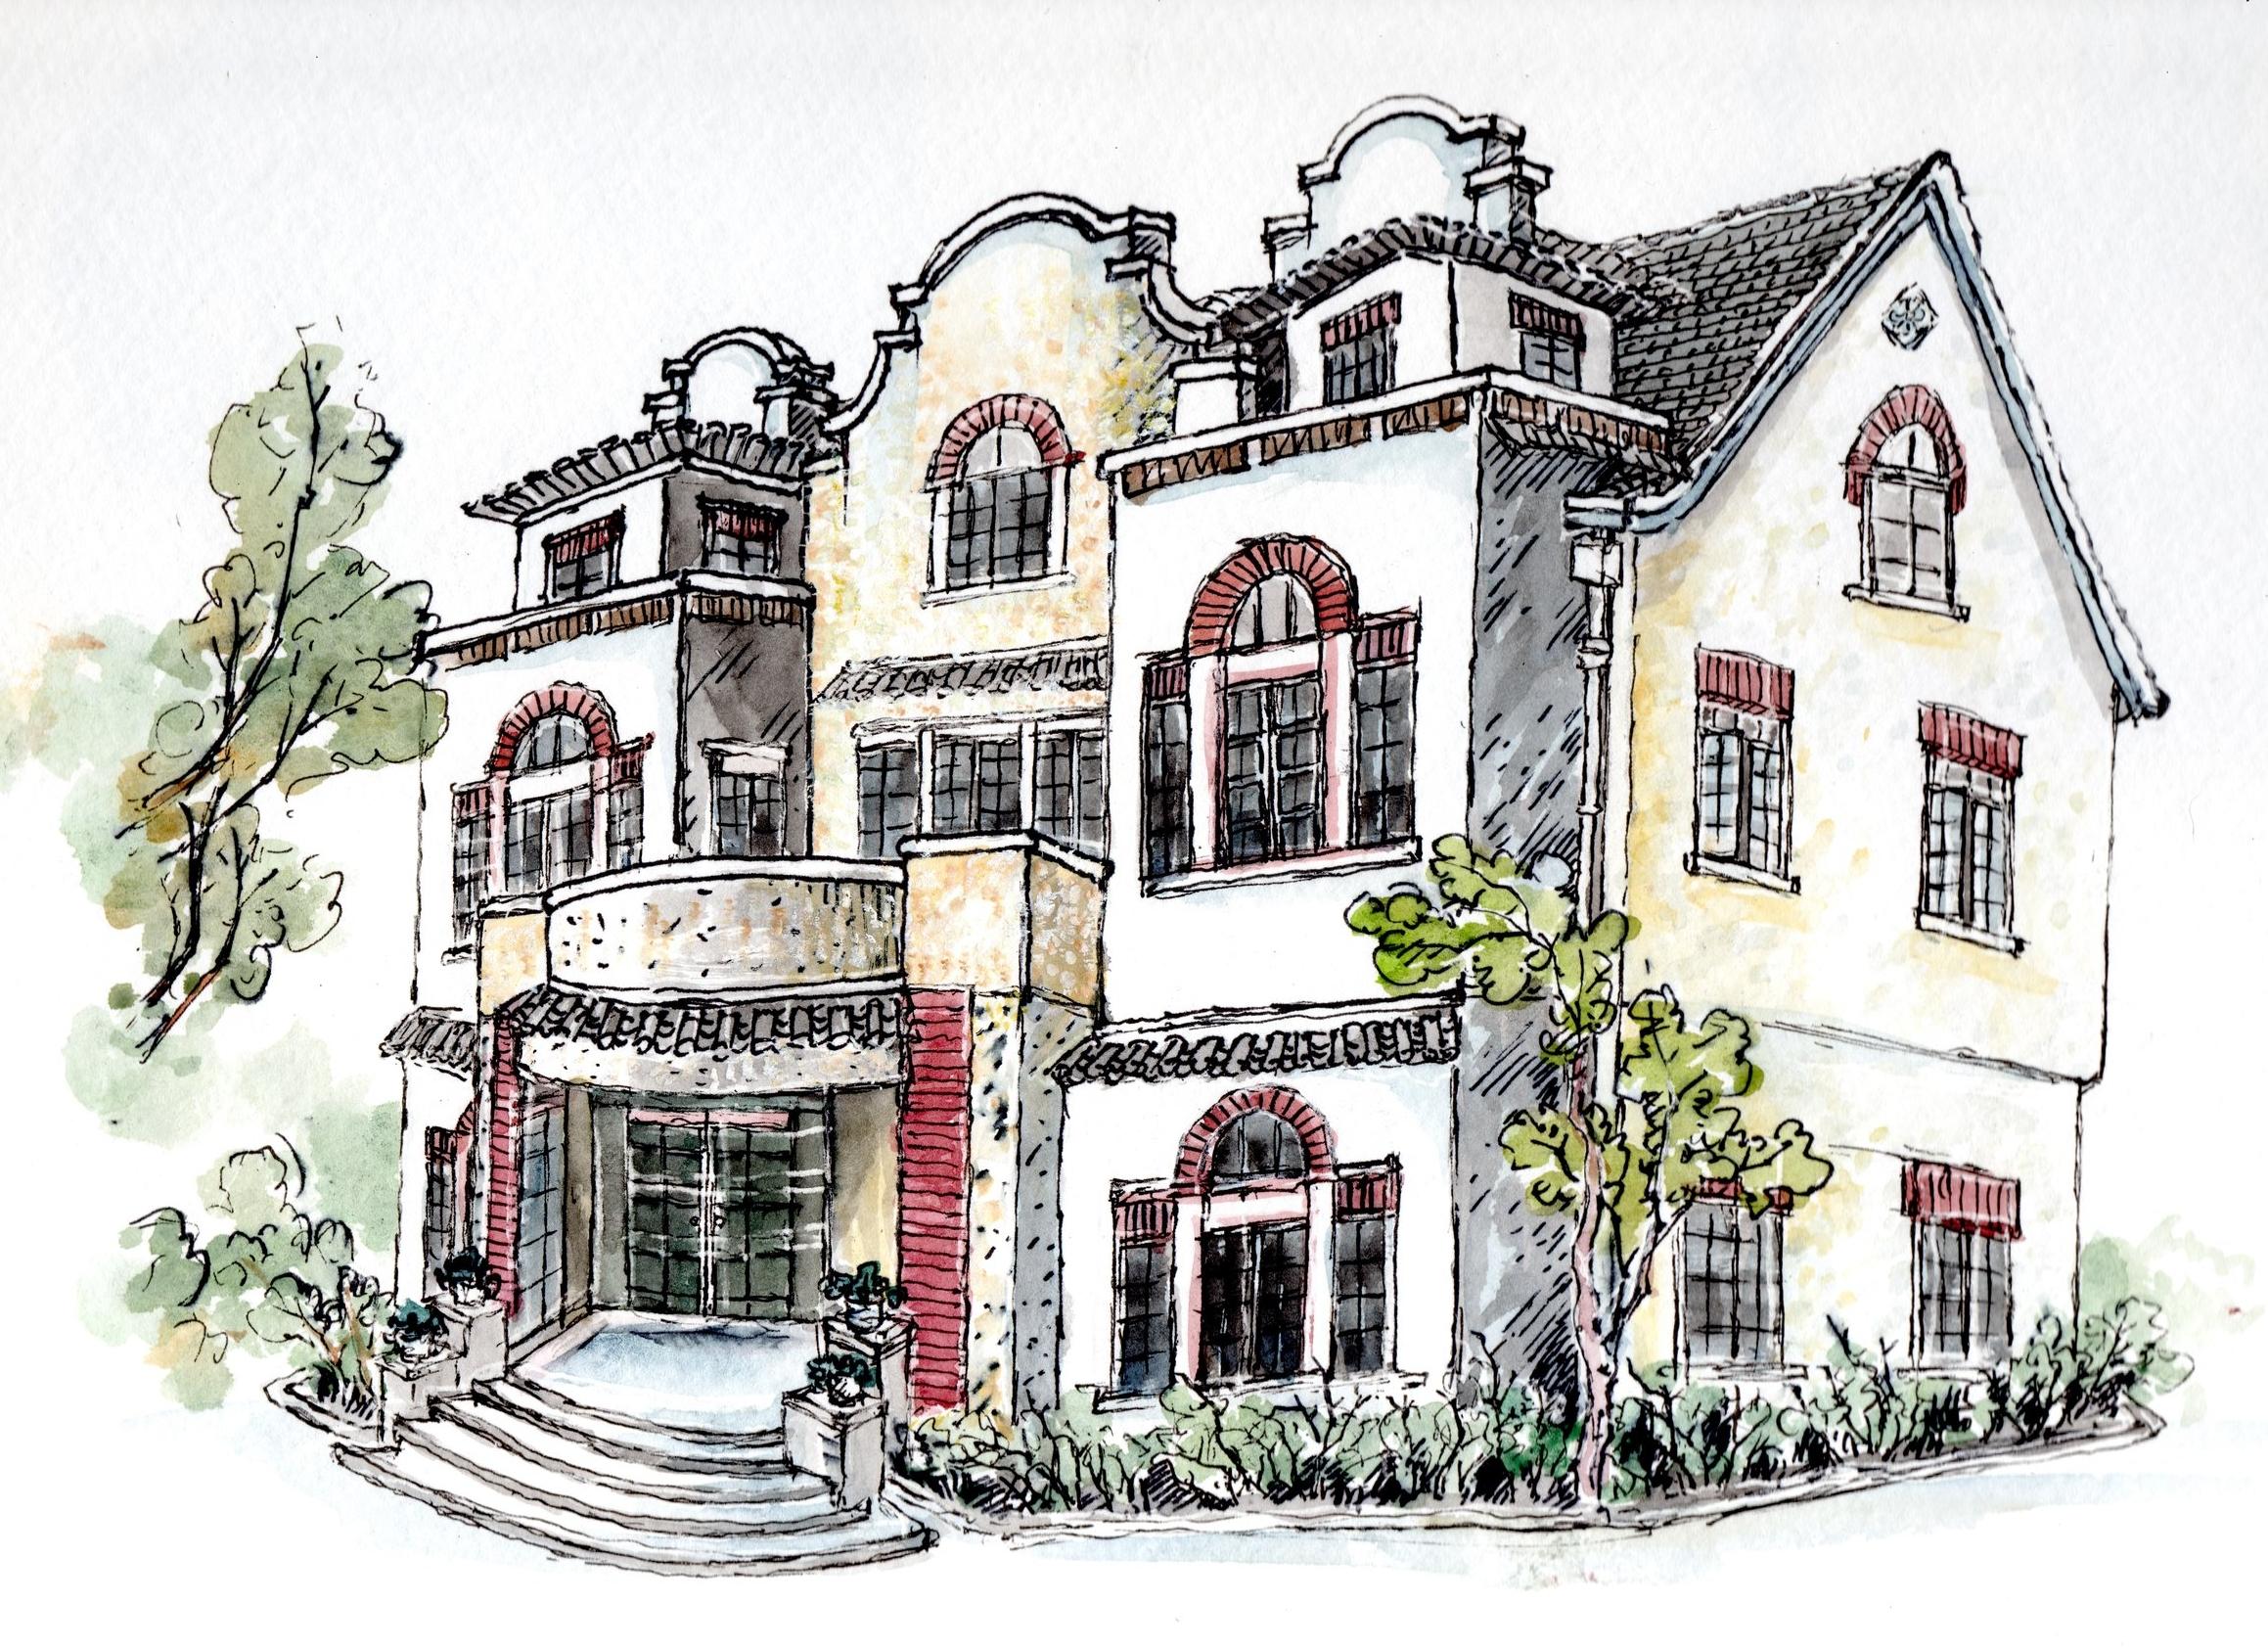 367 Zhenning Road, recreated -